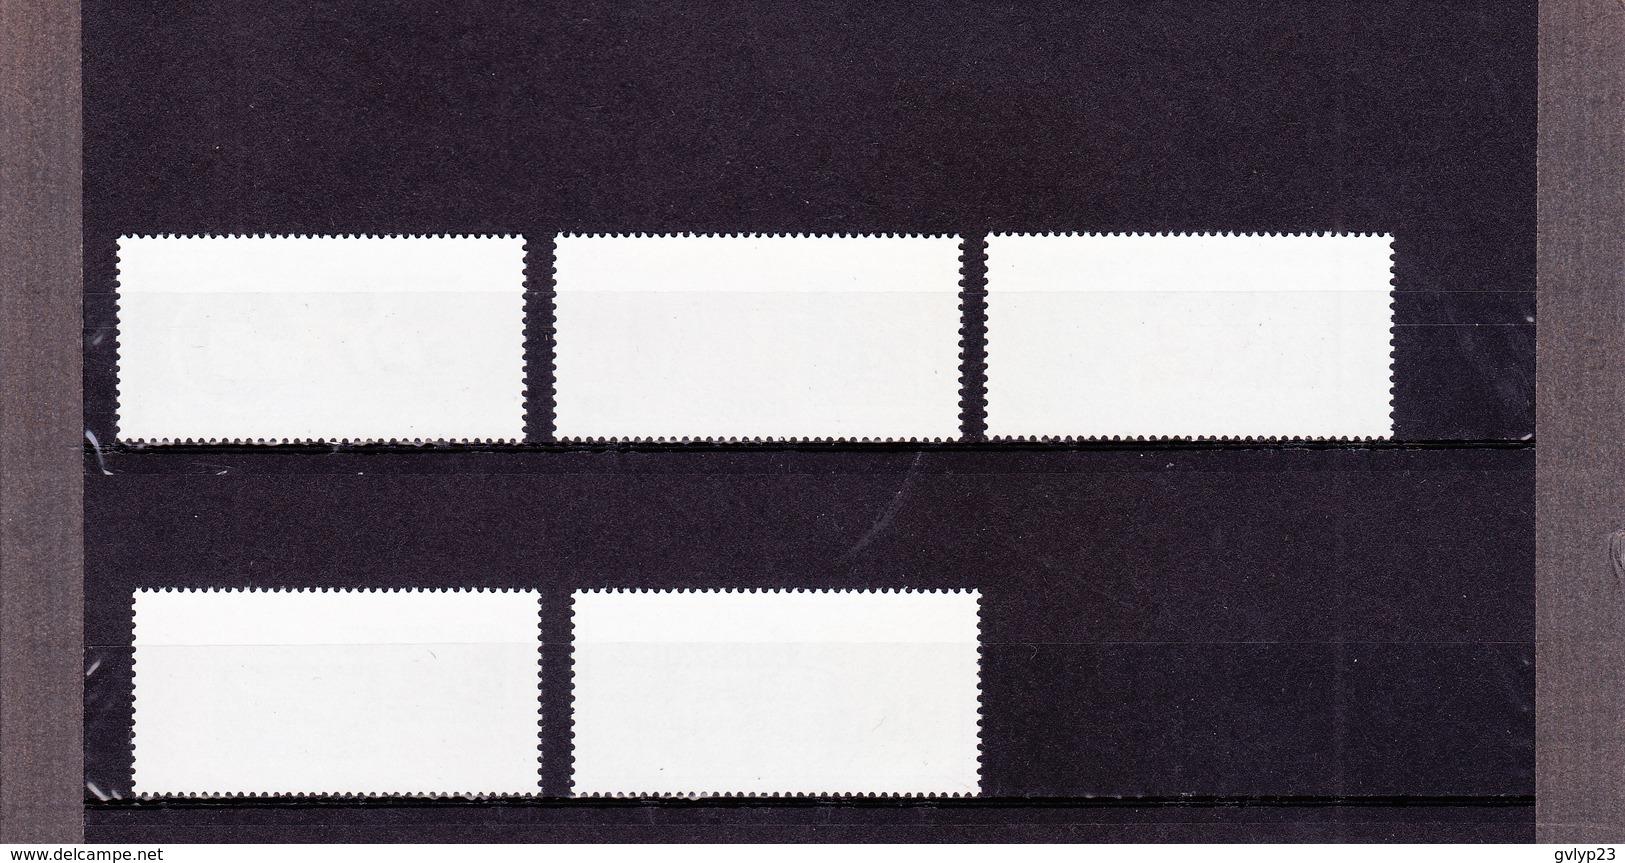 SENEGAL/CENTENAIRE DU TIMBRE-POSTE SENEGALAIS/ NEUF **/ 5 VALEURS /N°698/702 YVERT ET TELLIER 1987 - Postzegels Op Postzegels